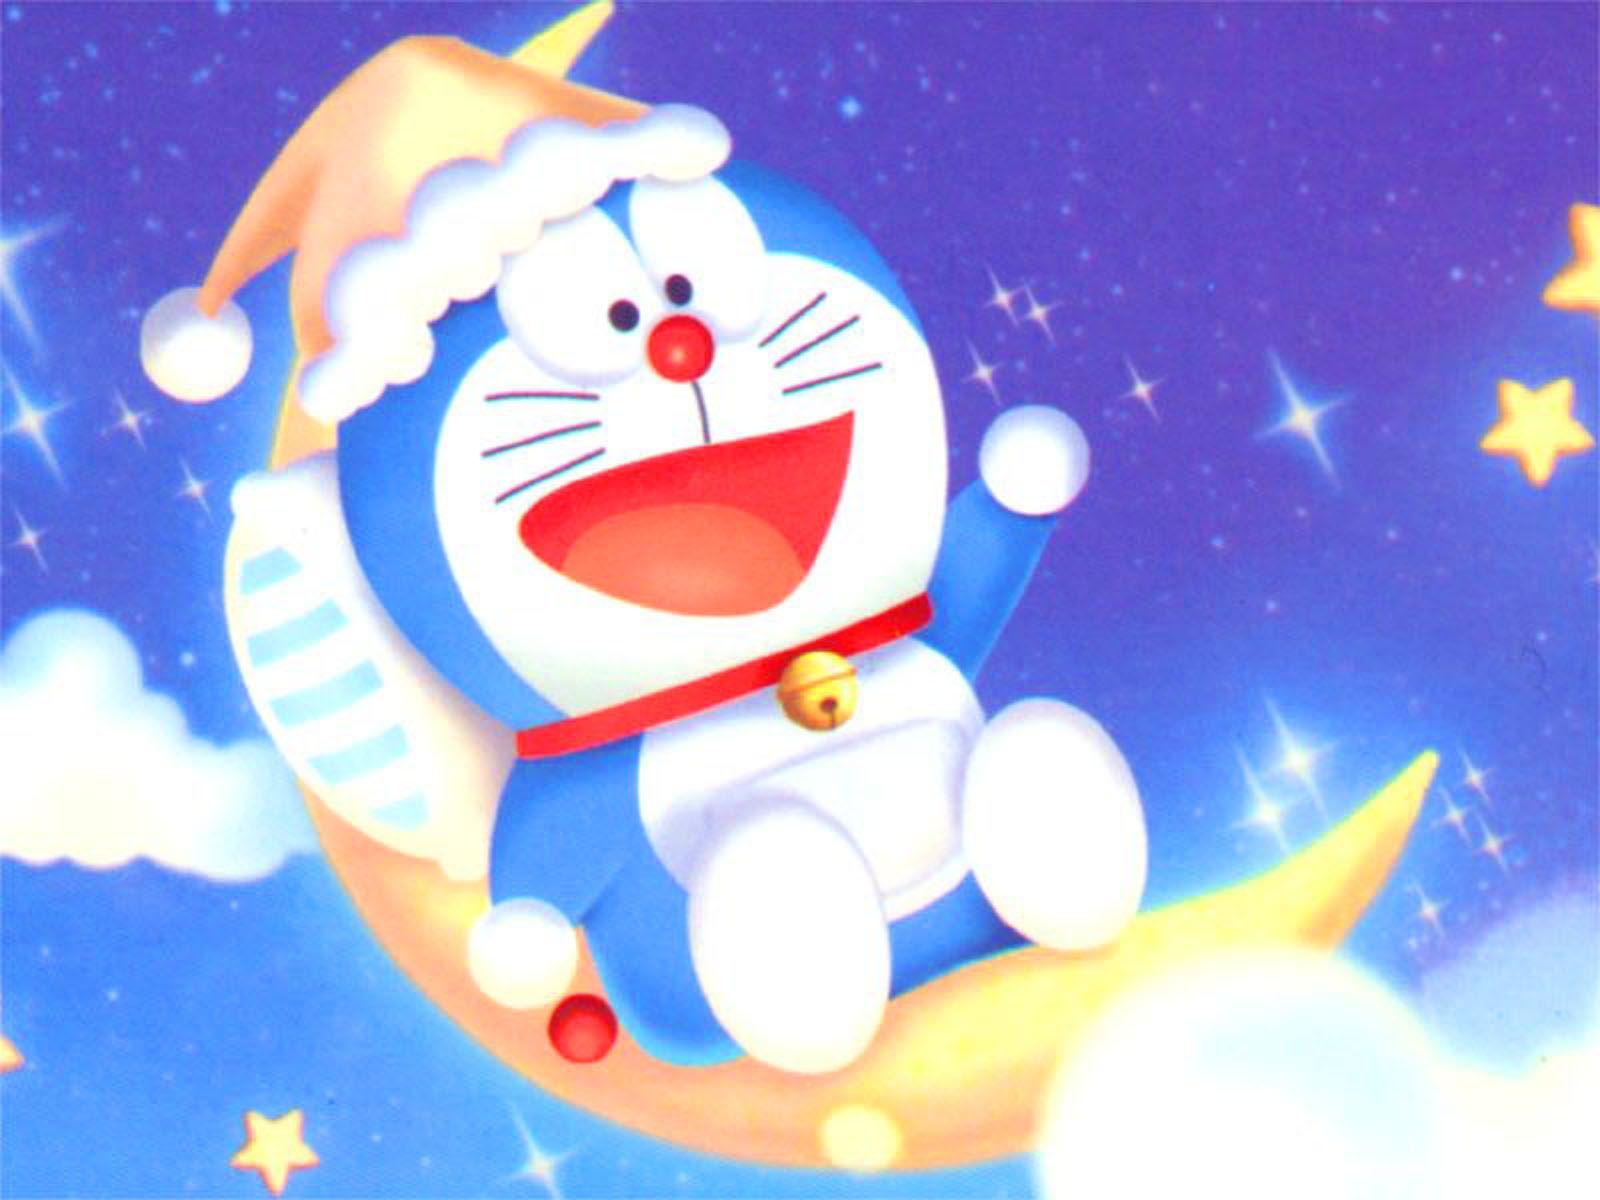 Doraemon 1600x1200 Wallpapers 1600x1200 Wallpapers Pictures Free Download Wallpaper Kartun Hd Doraemon Wallpaper Kartun Download wallpaper anime doraemon